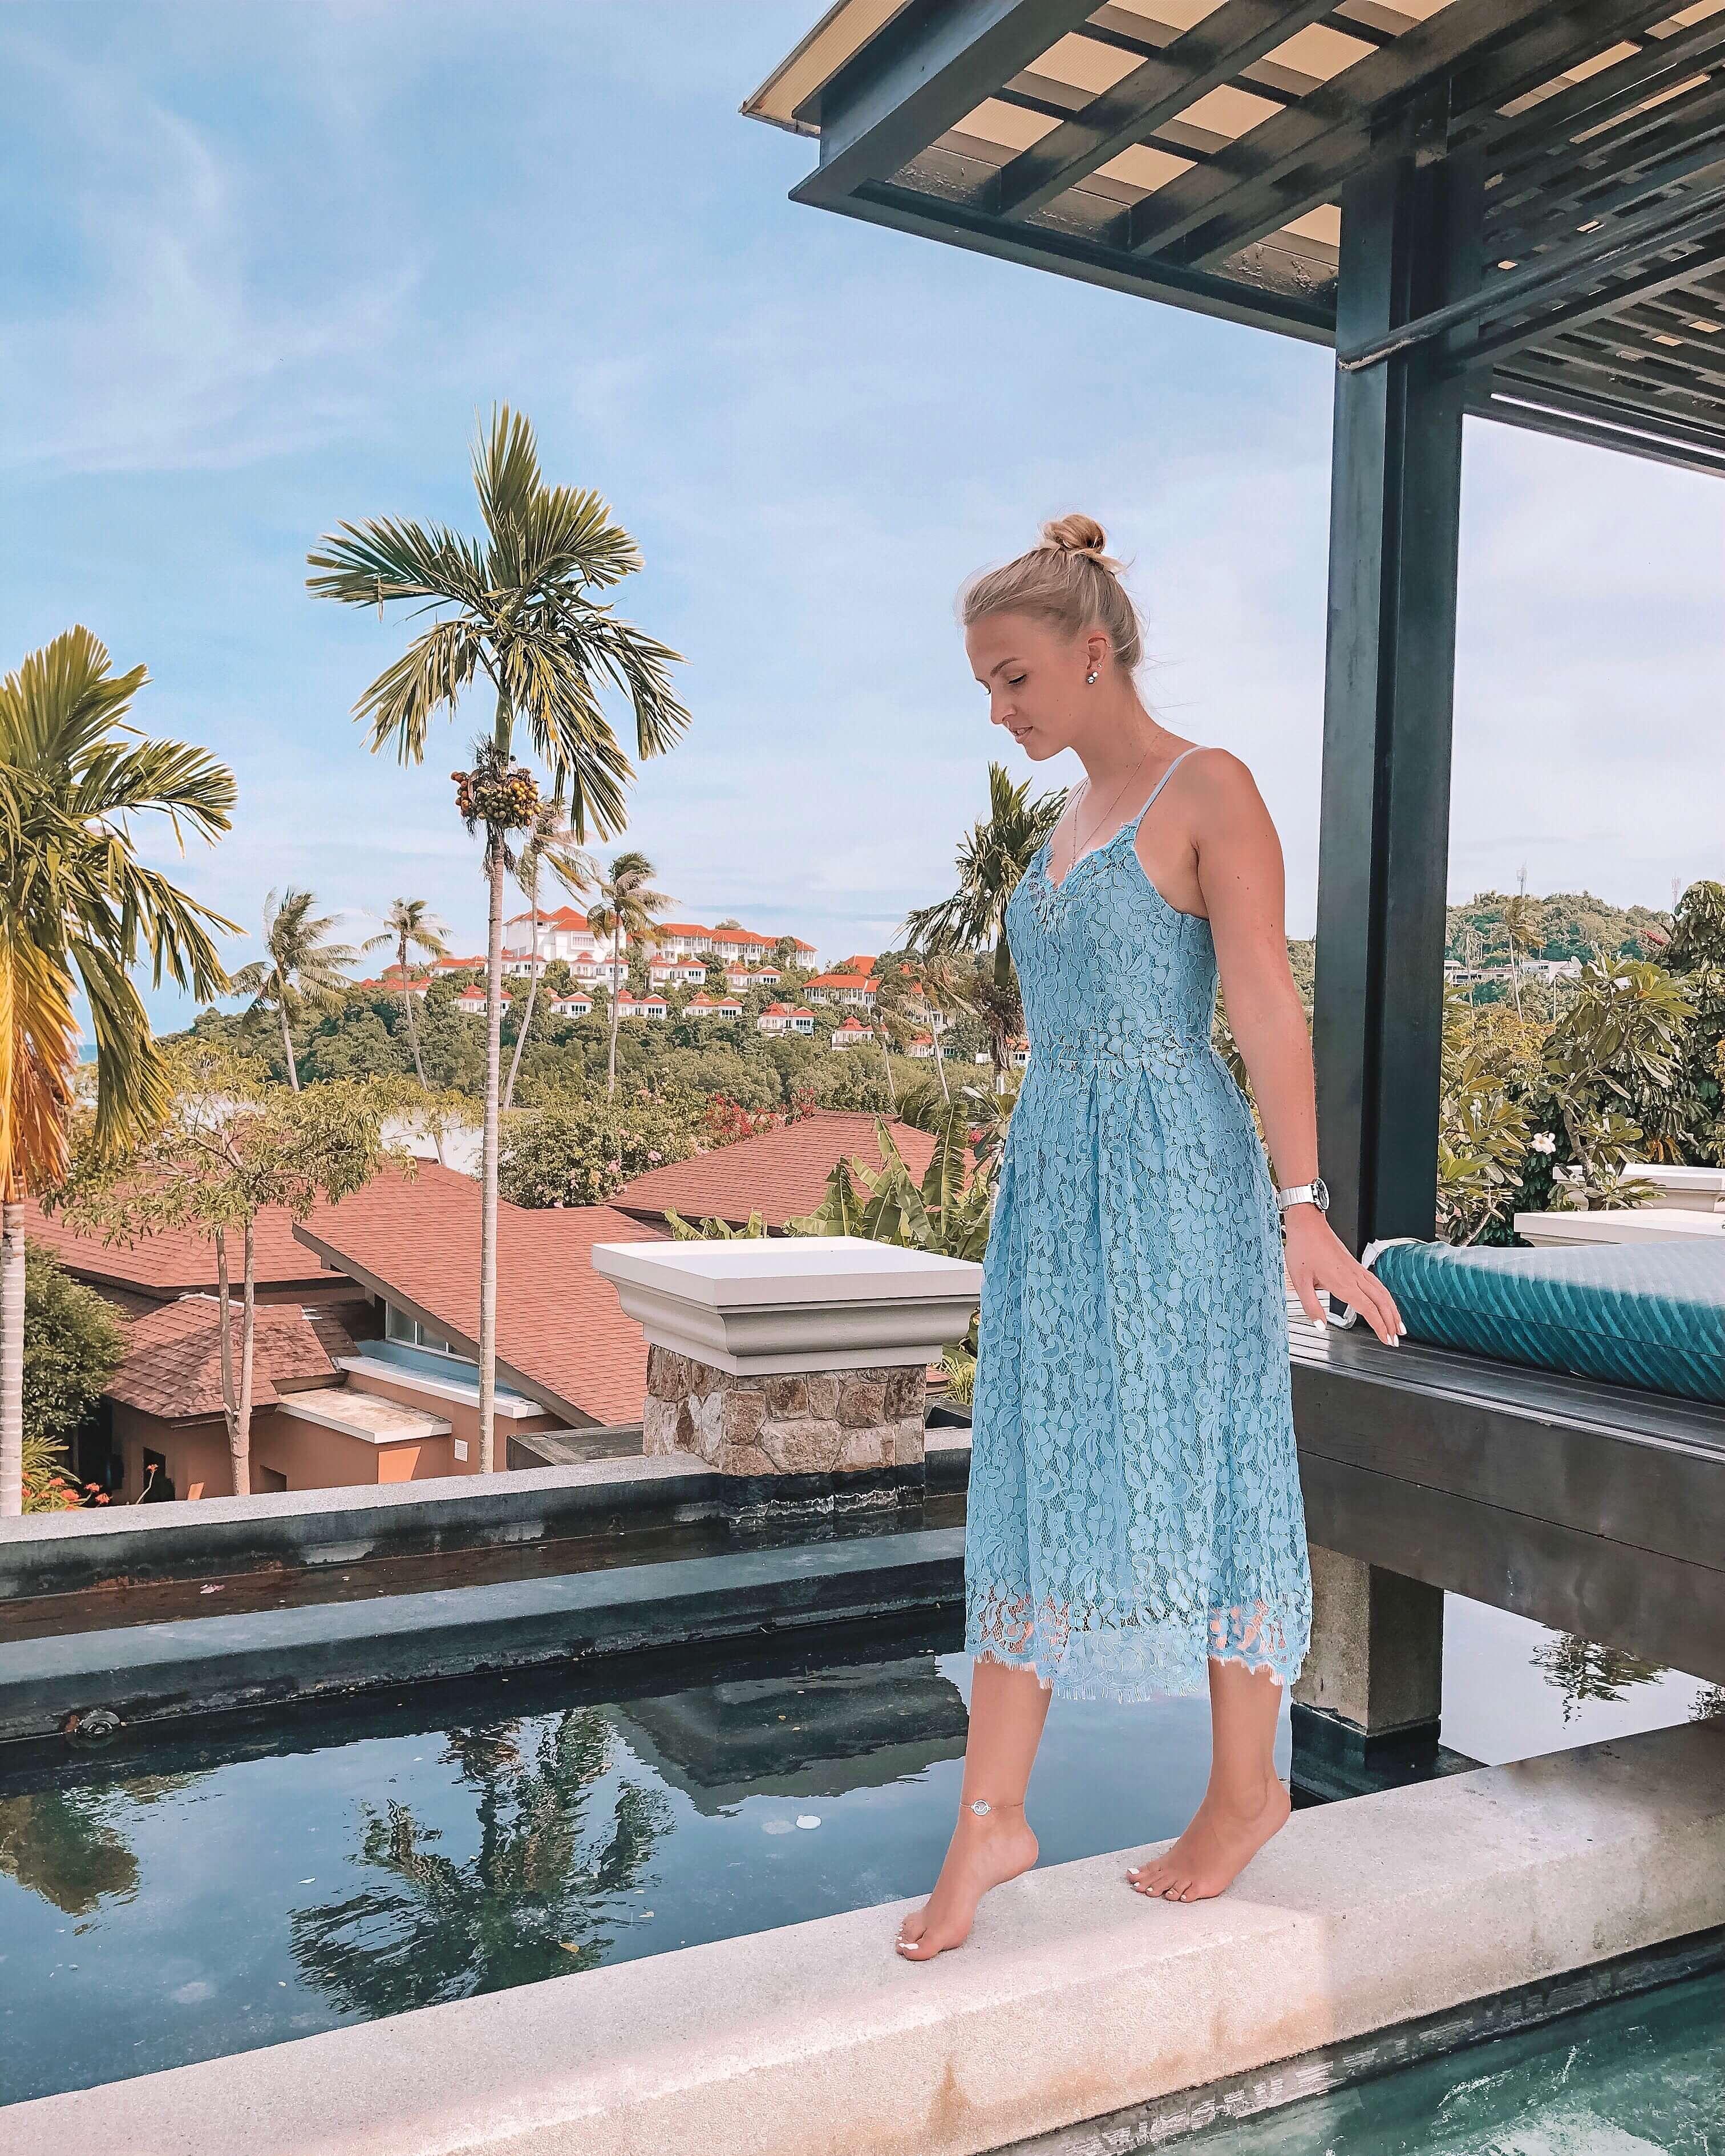 Thailand, Phuket, Urlaub, Asien, Travelguide, Reisebericht, Reisetipps, Sehenswürdigkeiten, Tipps, Katefully, Reiseblog, Travel, Phi Phi Island, Pullman Phuket